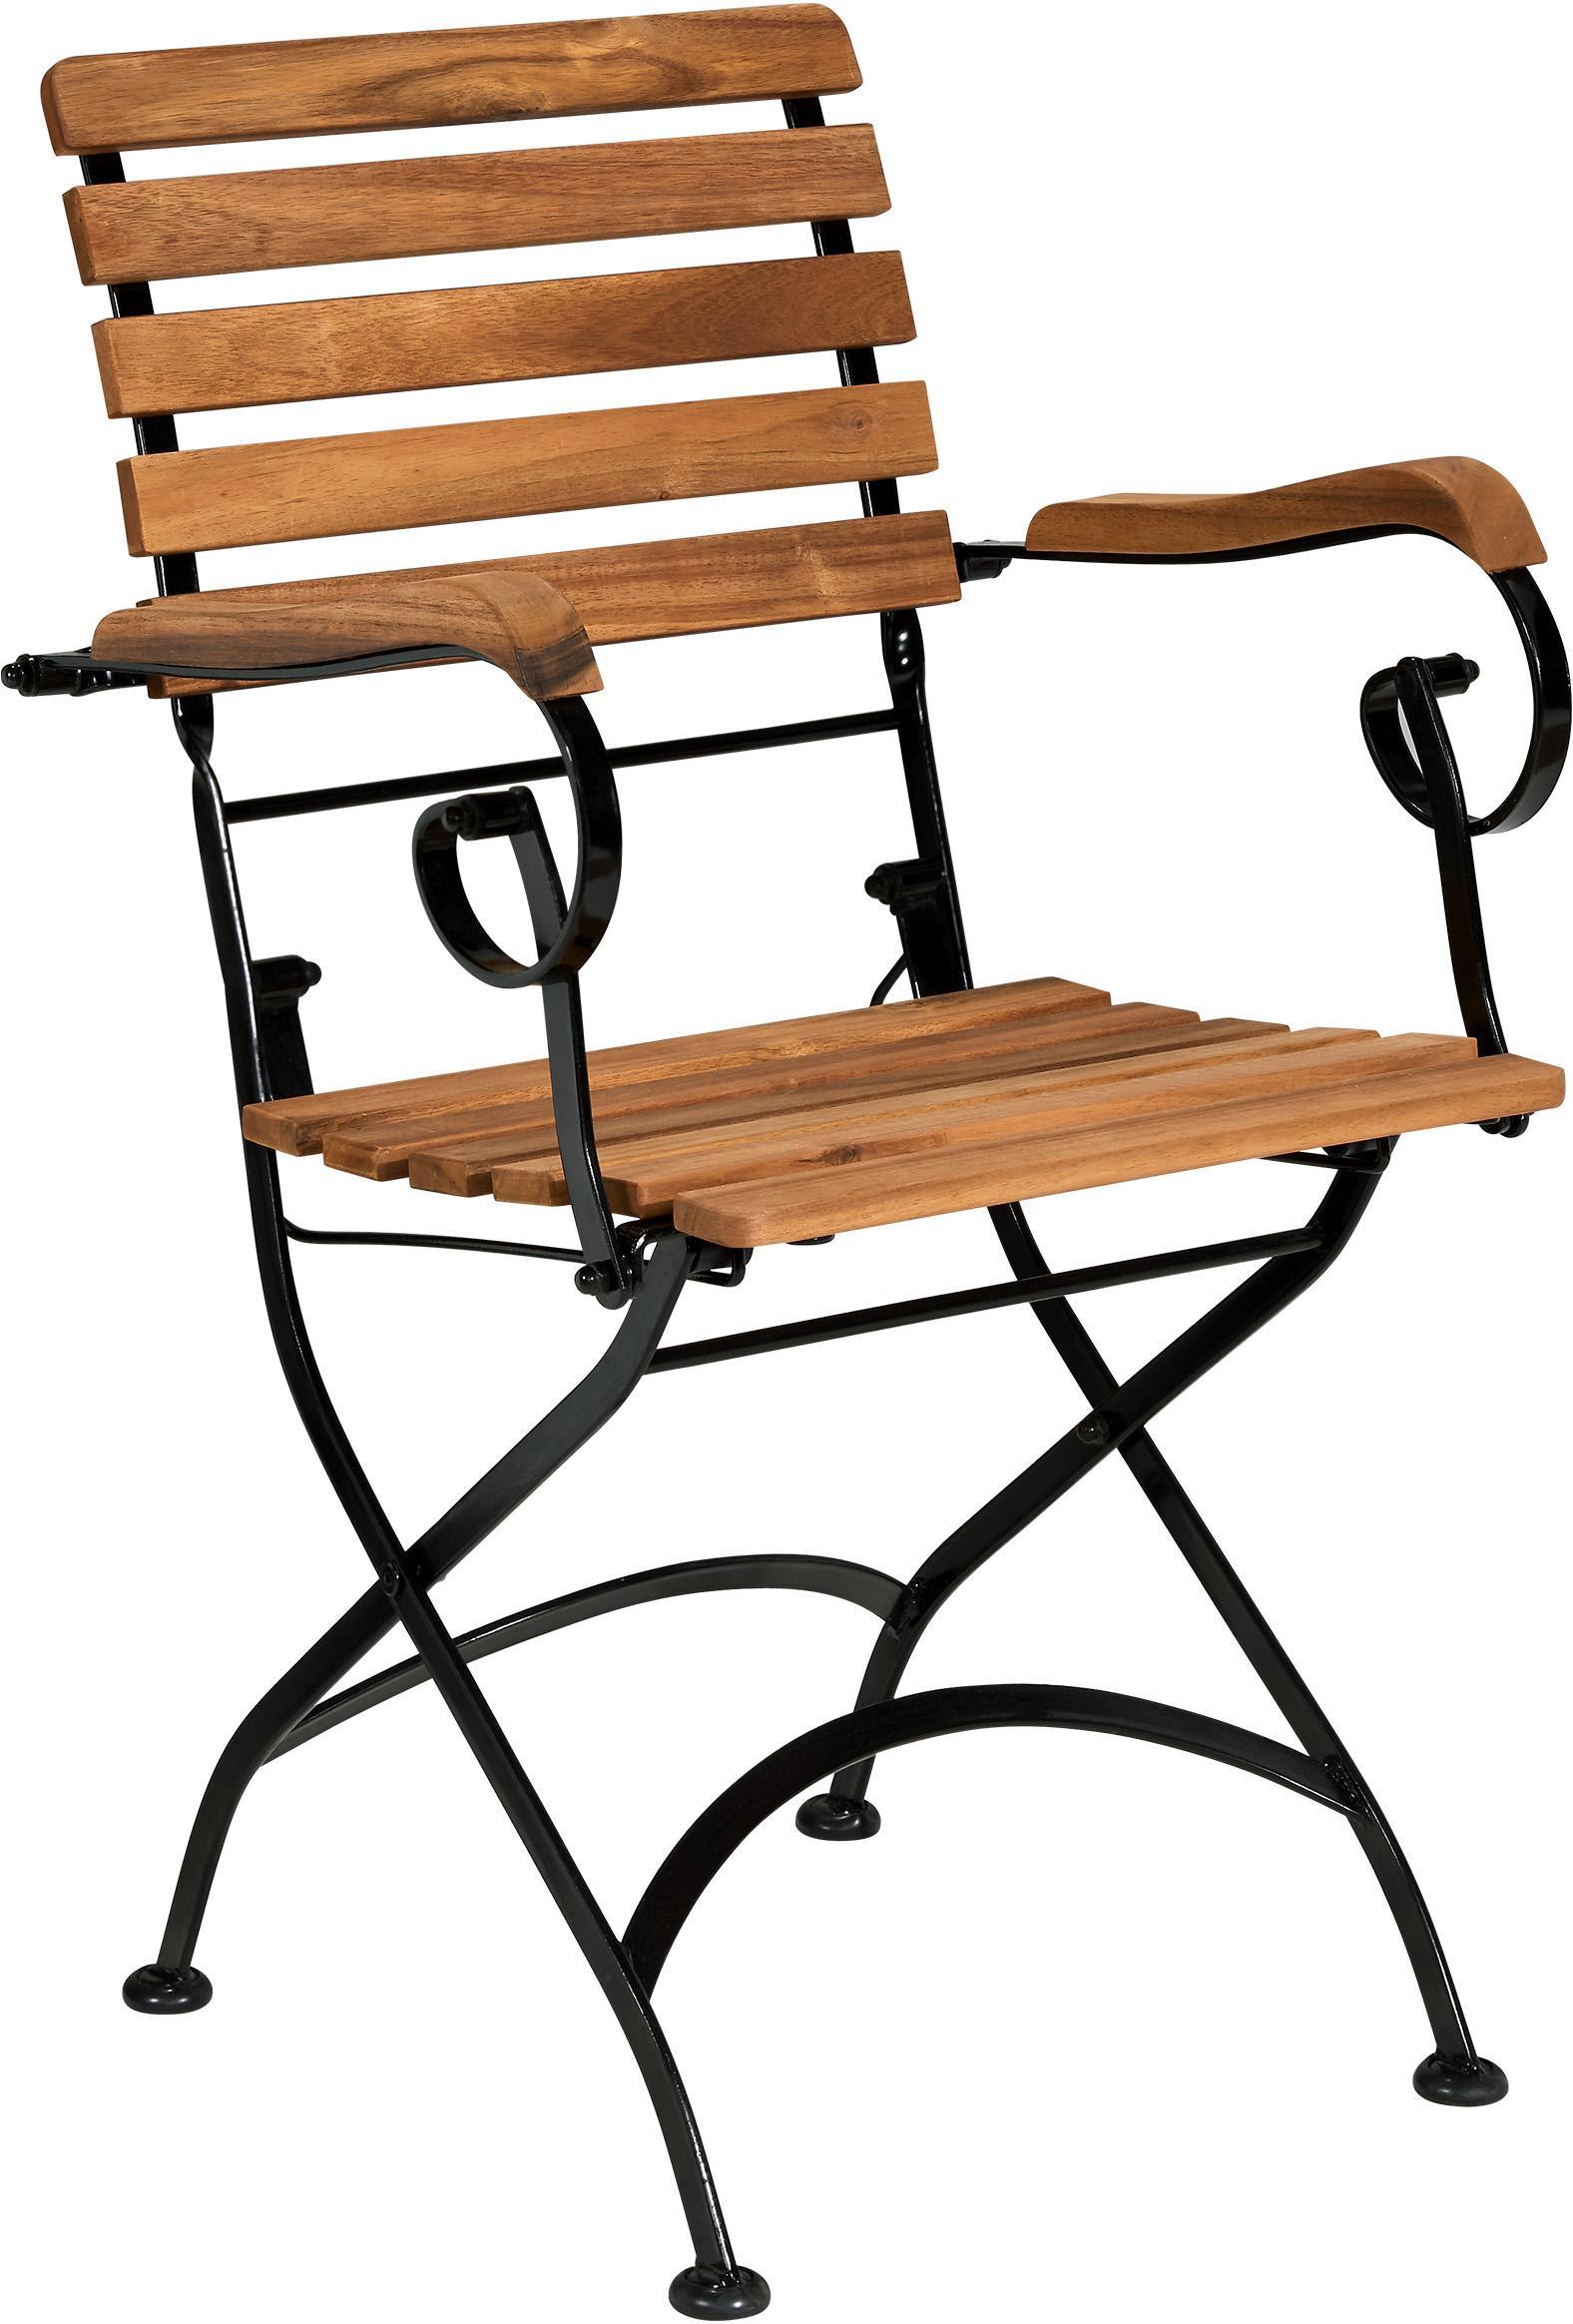 Sillas plegables con reposabrazos de exterior Parklife, 2uds., Asiento: madera de acacia aceitada, Estructura: metal galvanizado con pin, Negro, madera de acacia, An 59x F 52 cm